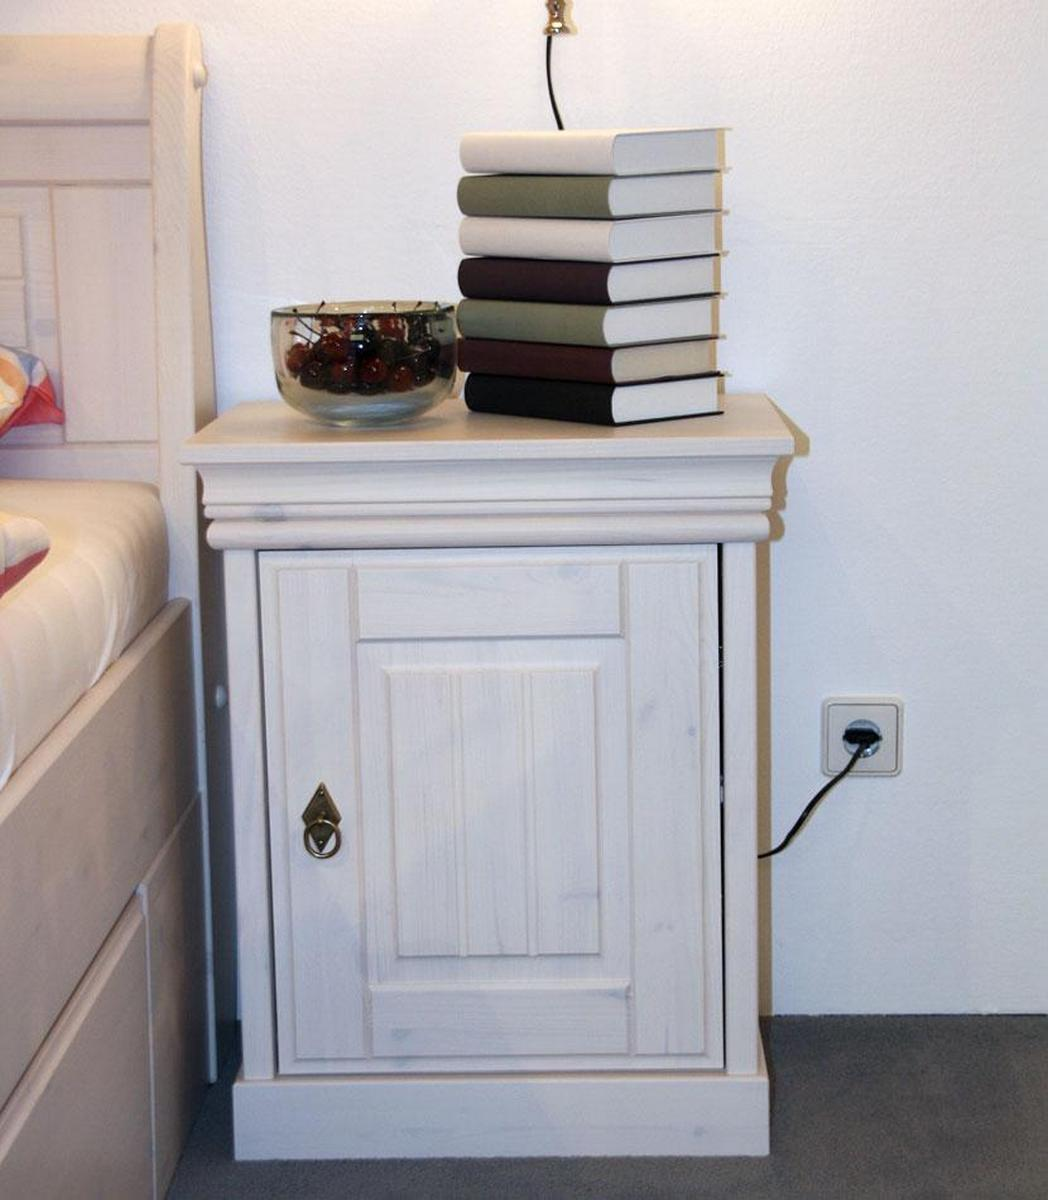 komplettes schlafzimmer weiss 4-teilig komplett holz kiefer neapel - Schlafzimmer Landhausstil Kiefer Weiss